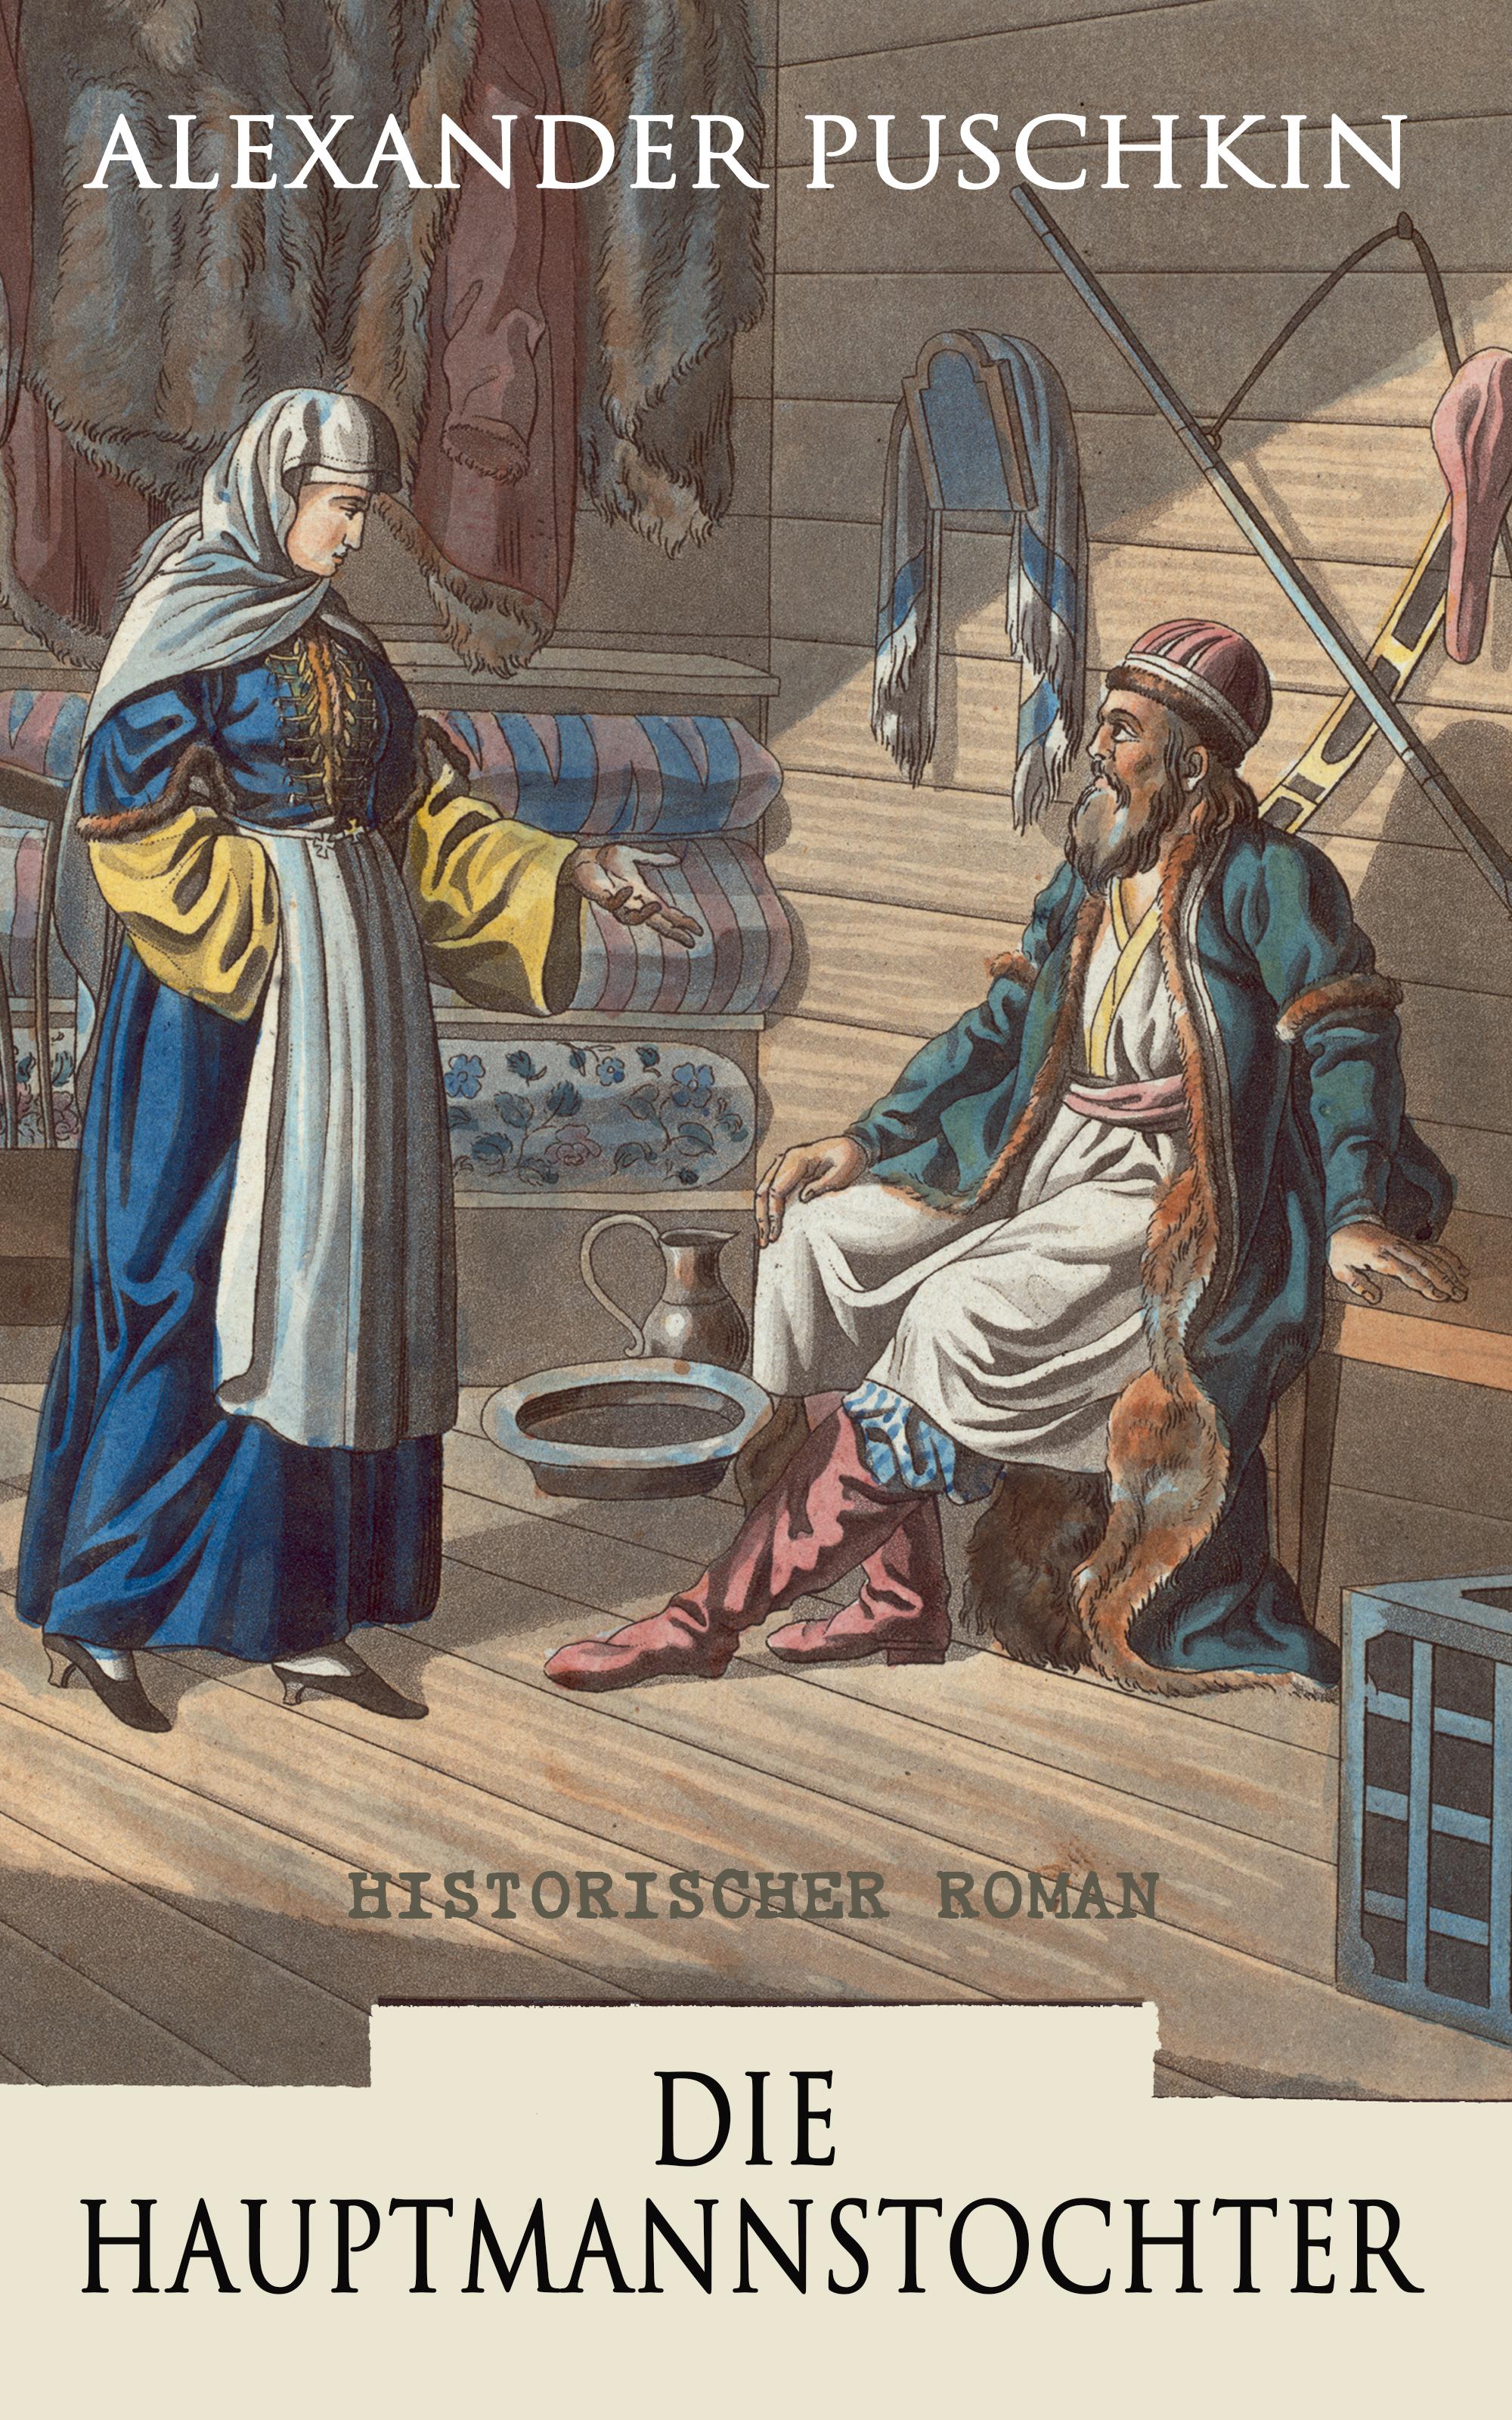 цена Александр Пушкин Die Hauptmannstochter: Historischer Roman онлайн в 2017 году